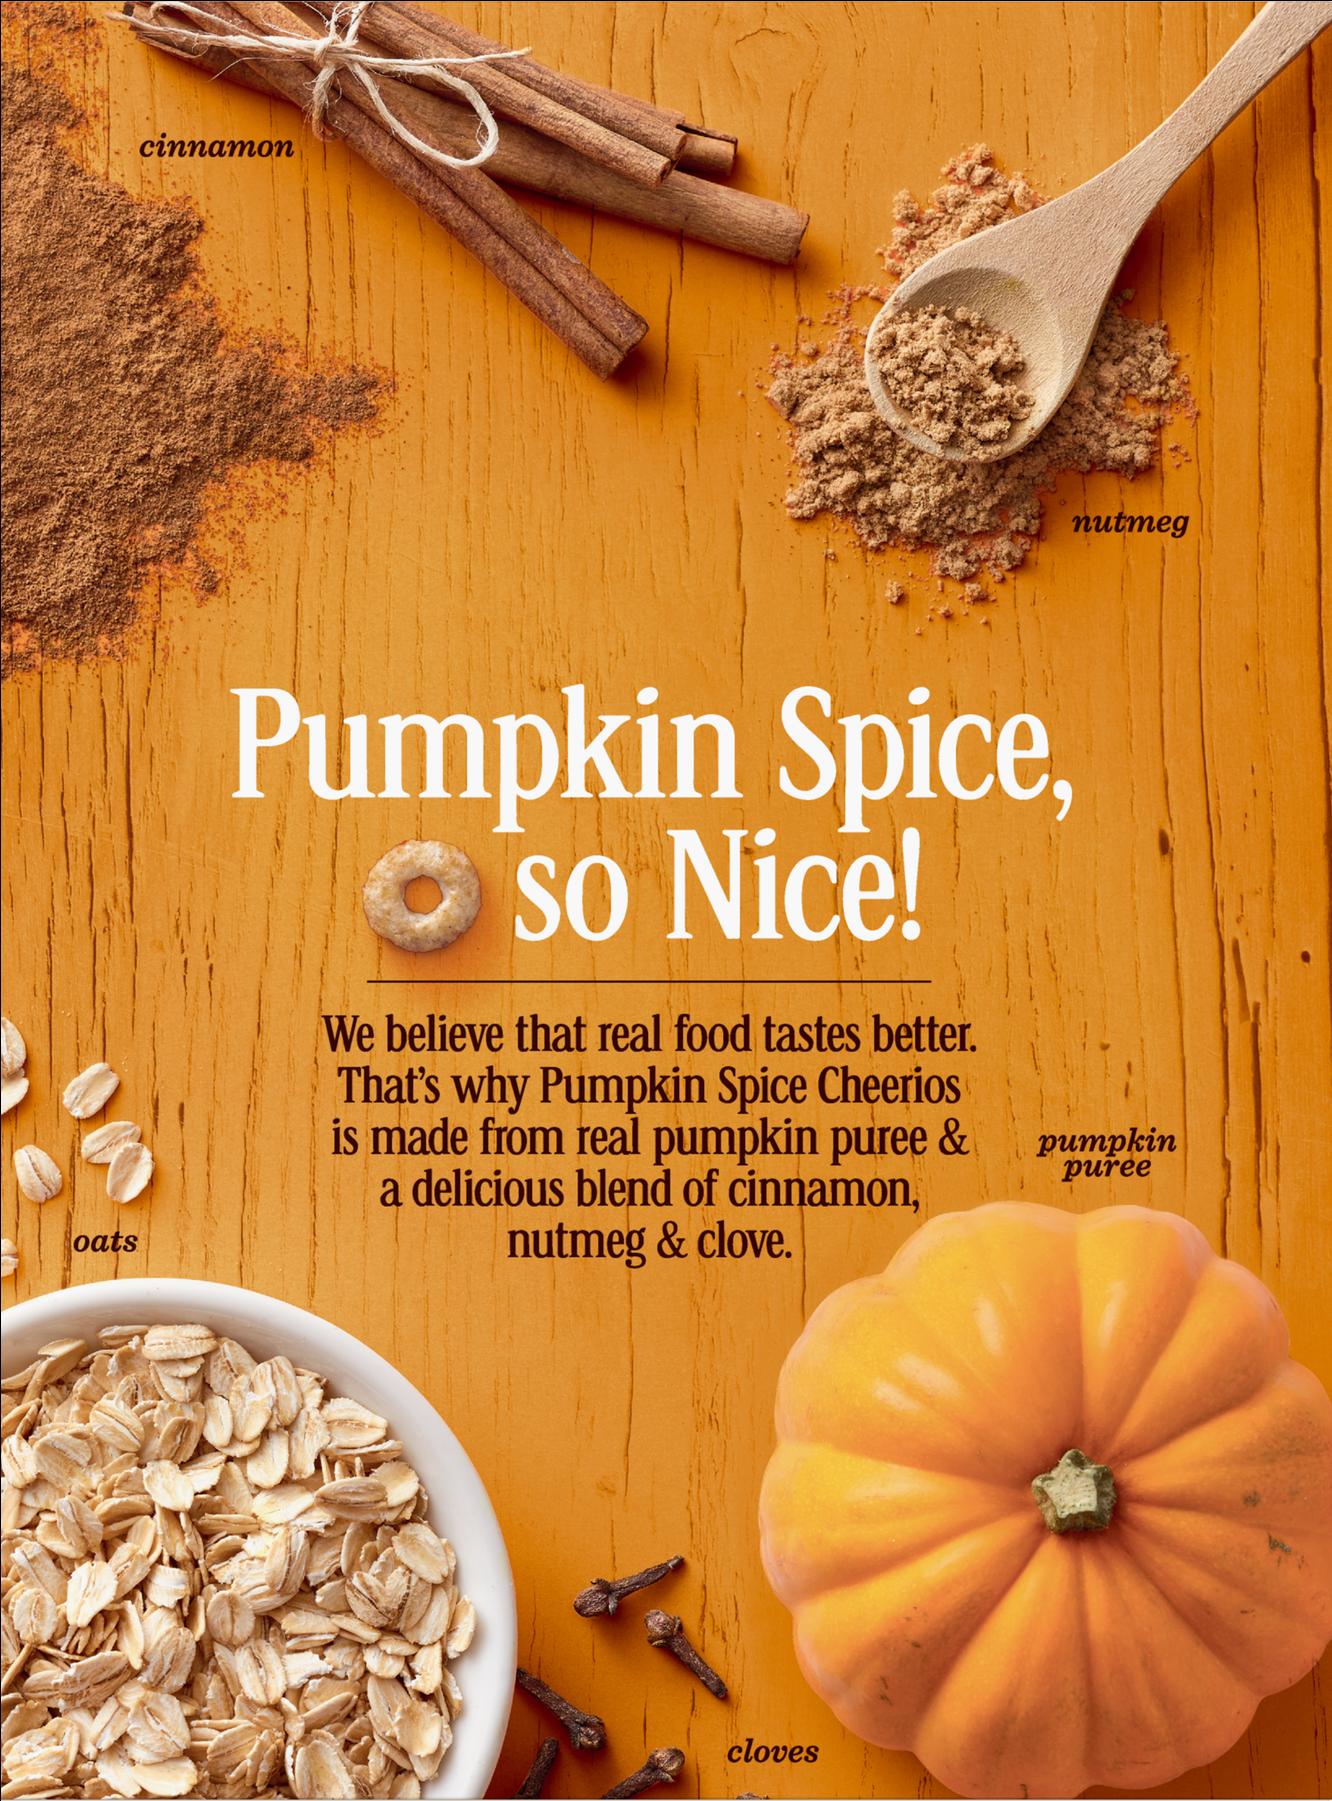 Pumpkin Spice Cheerios, Gluten Free, Cereal With Oats - Pumpkin Spice Cheerios Box (1800x1800), Png Download